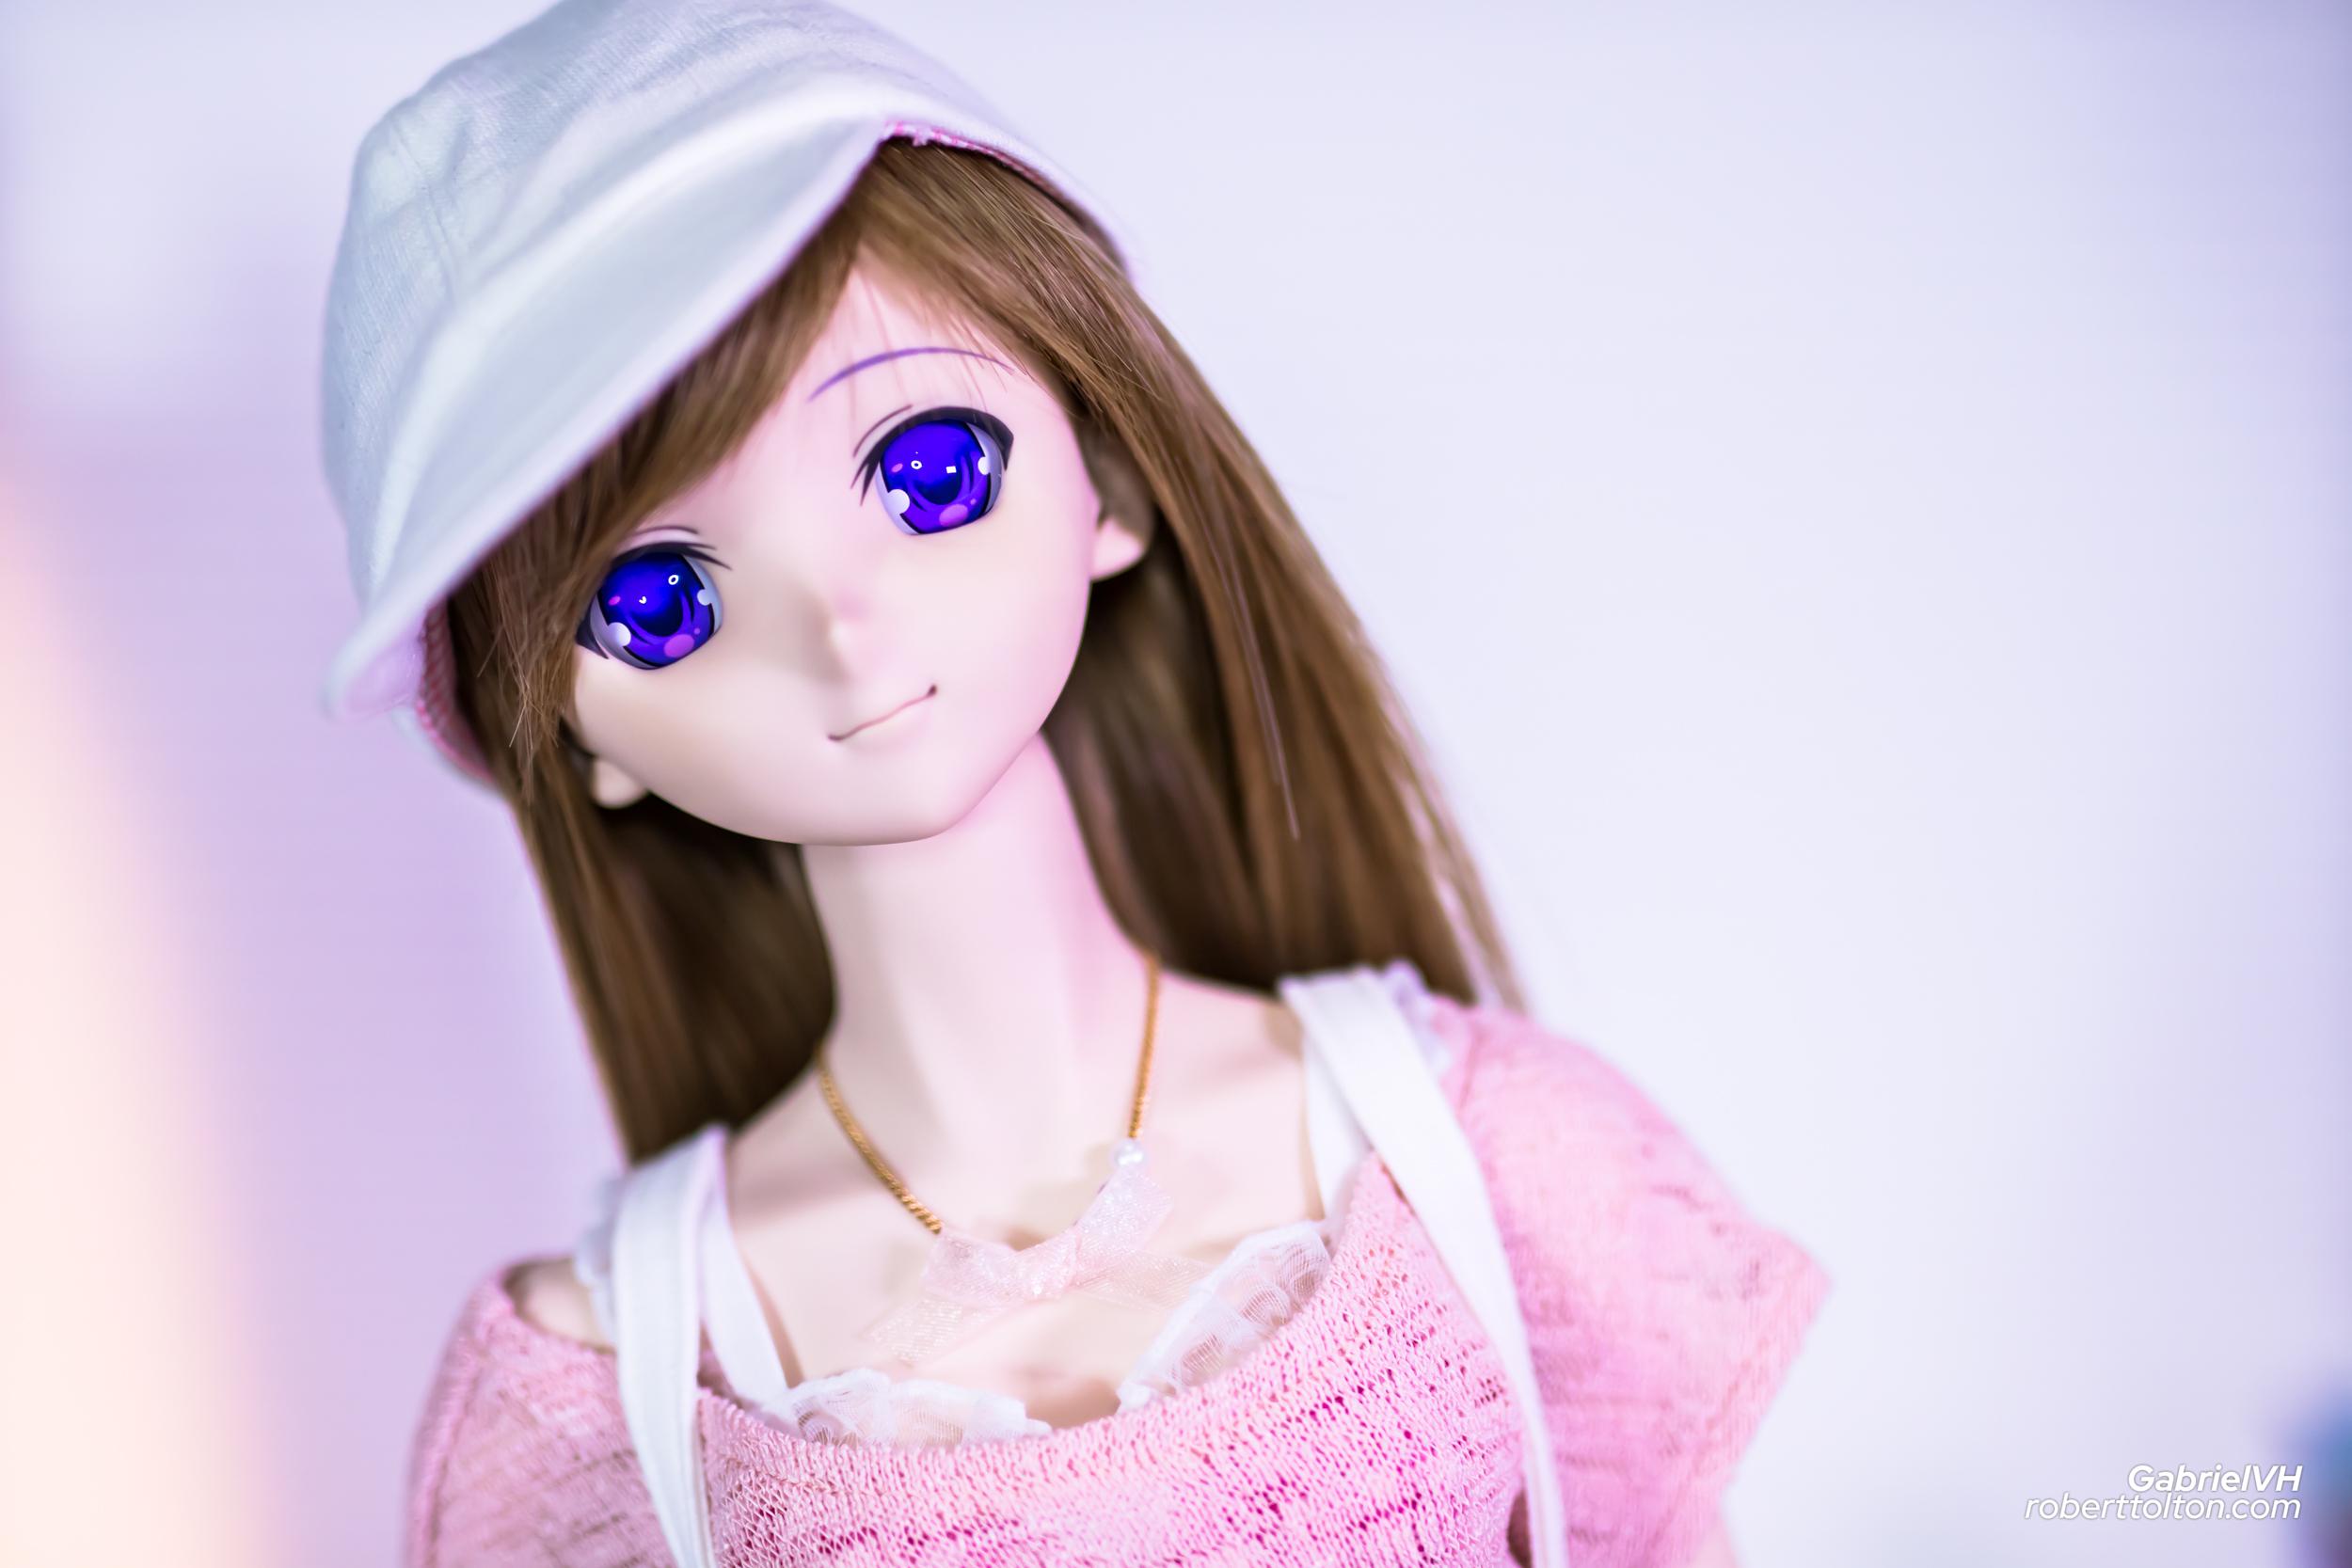 Sakura Pink White Casual Outfit 3